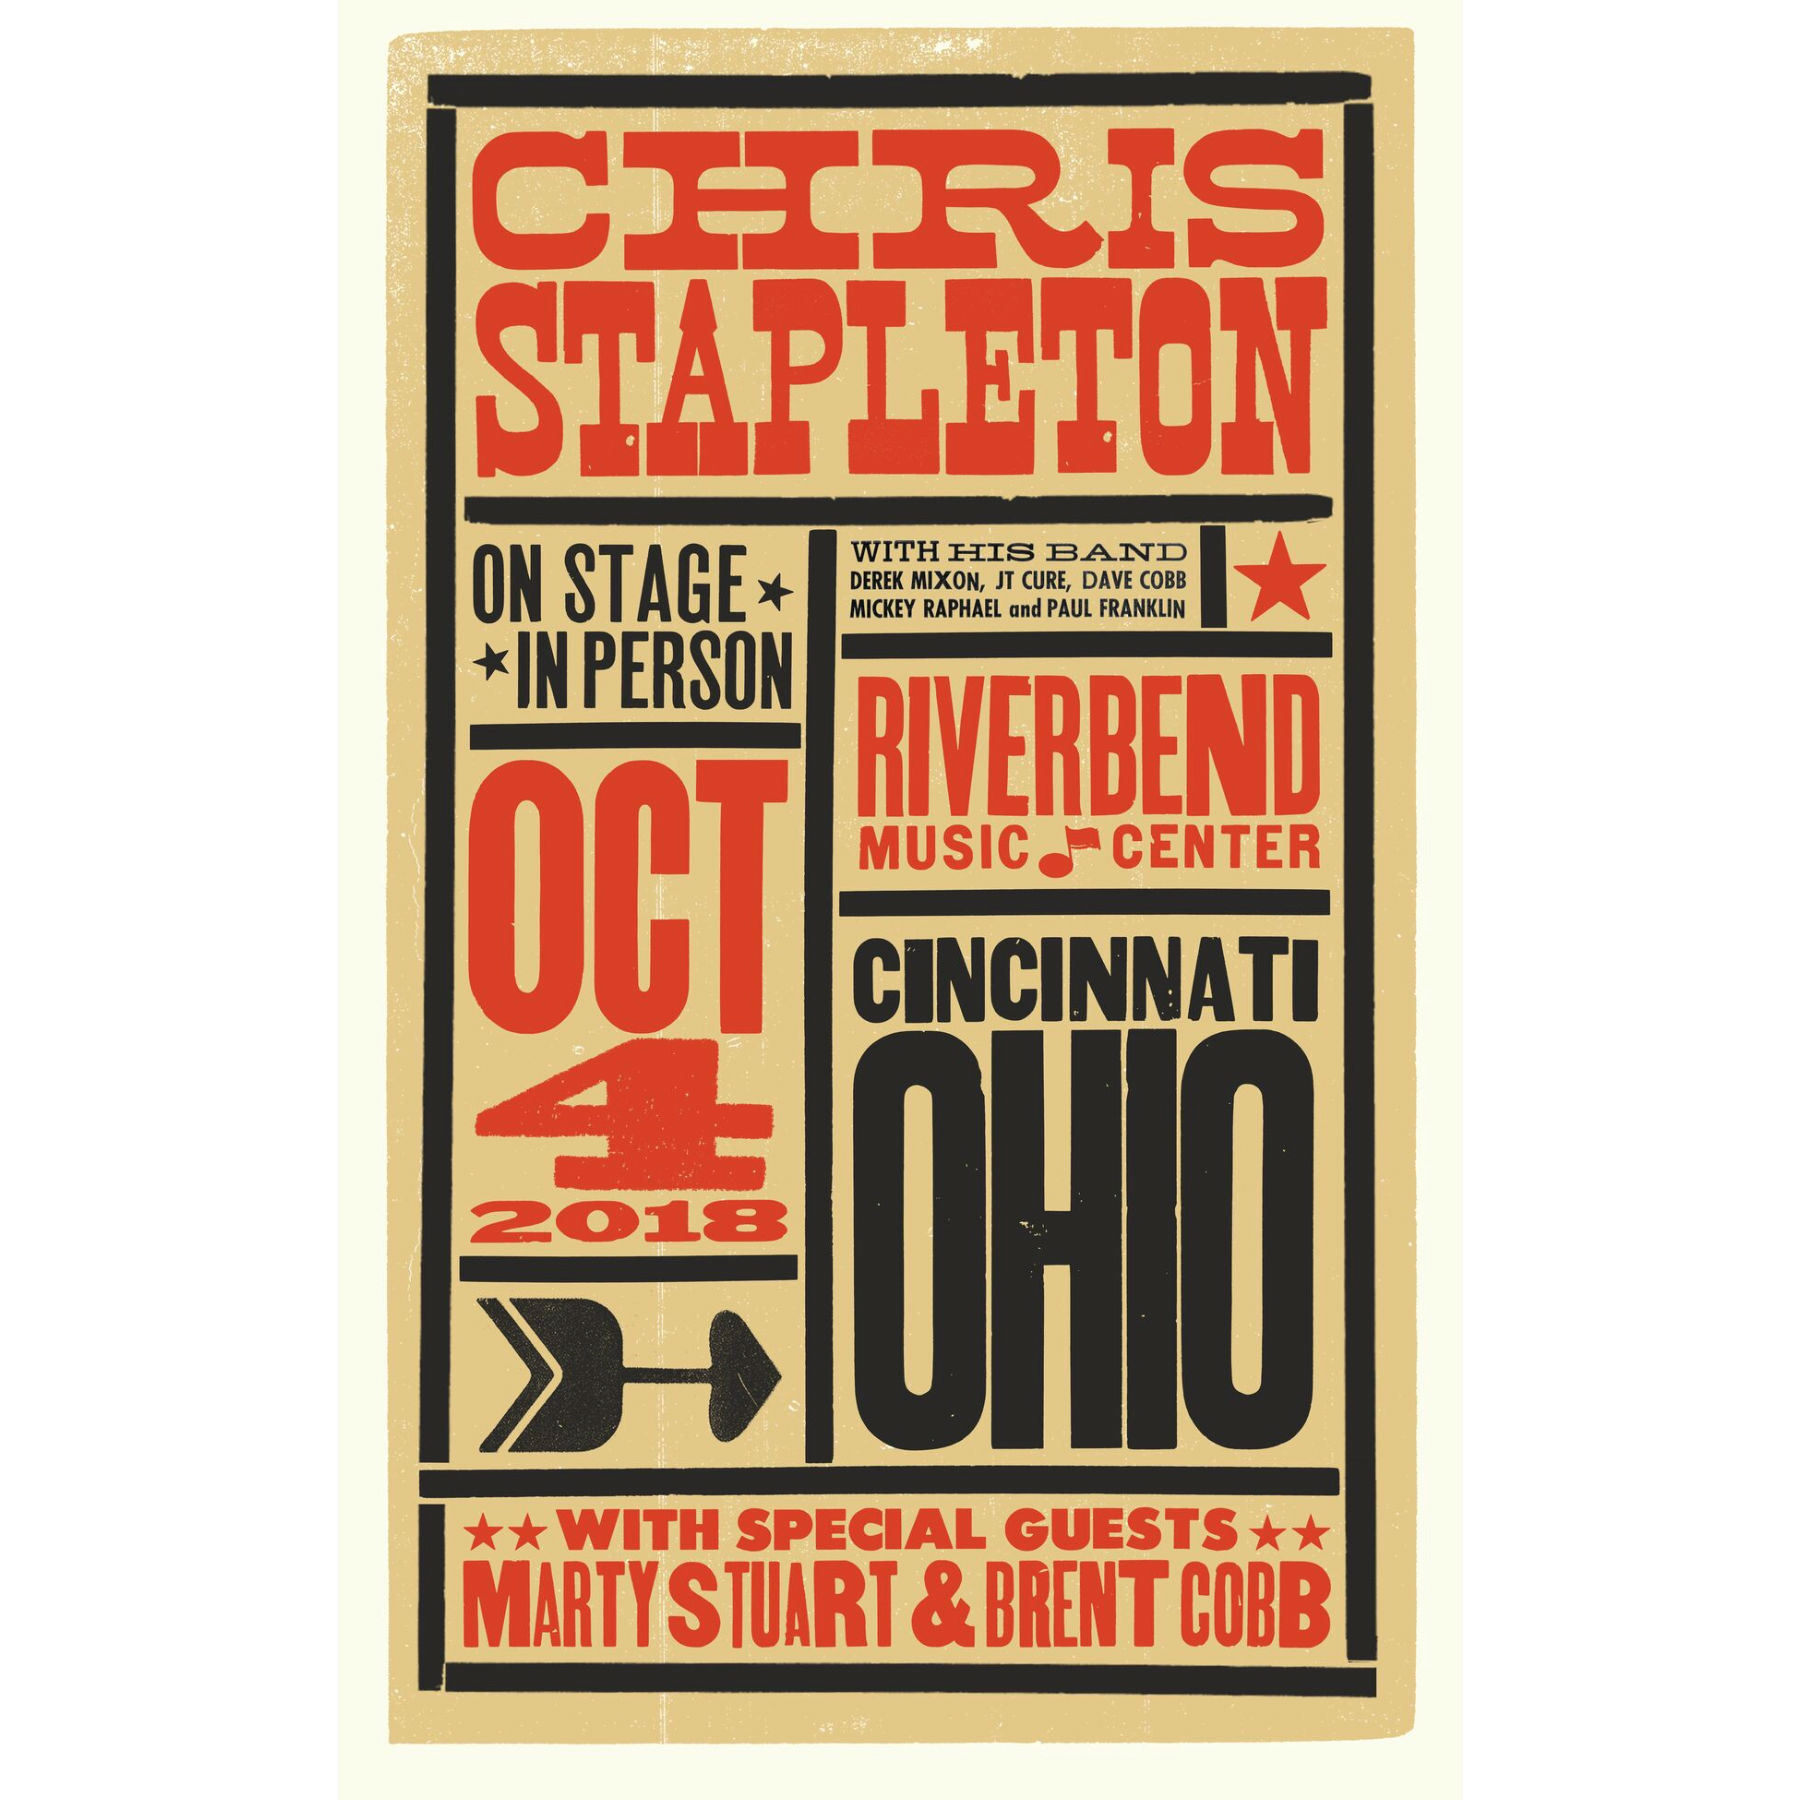 Chris Stapleton Show Poster – Cincinnati, OH 10/4/18